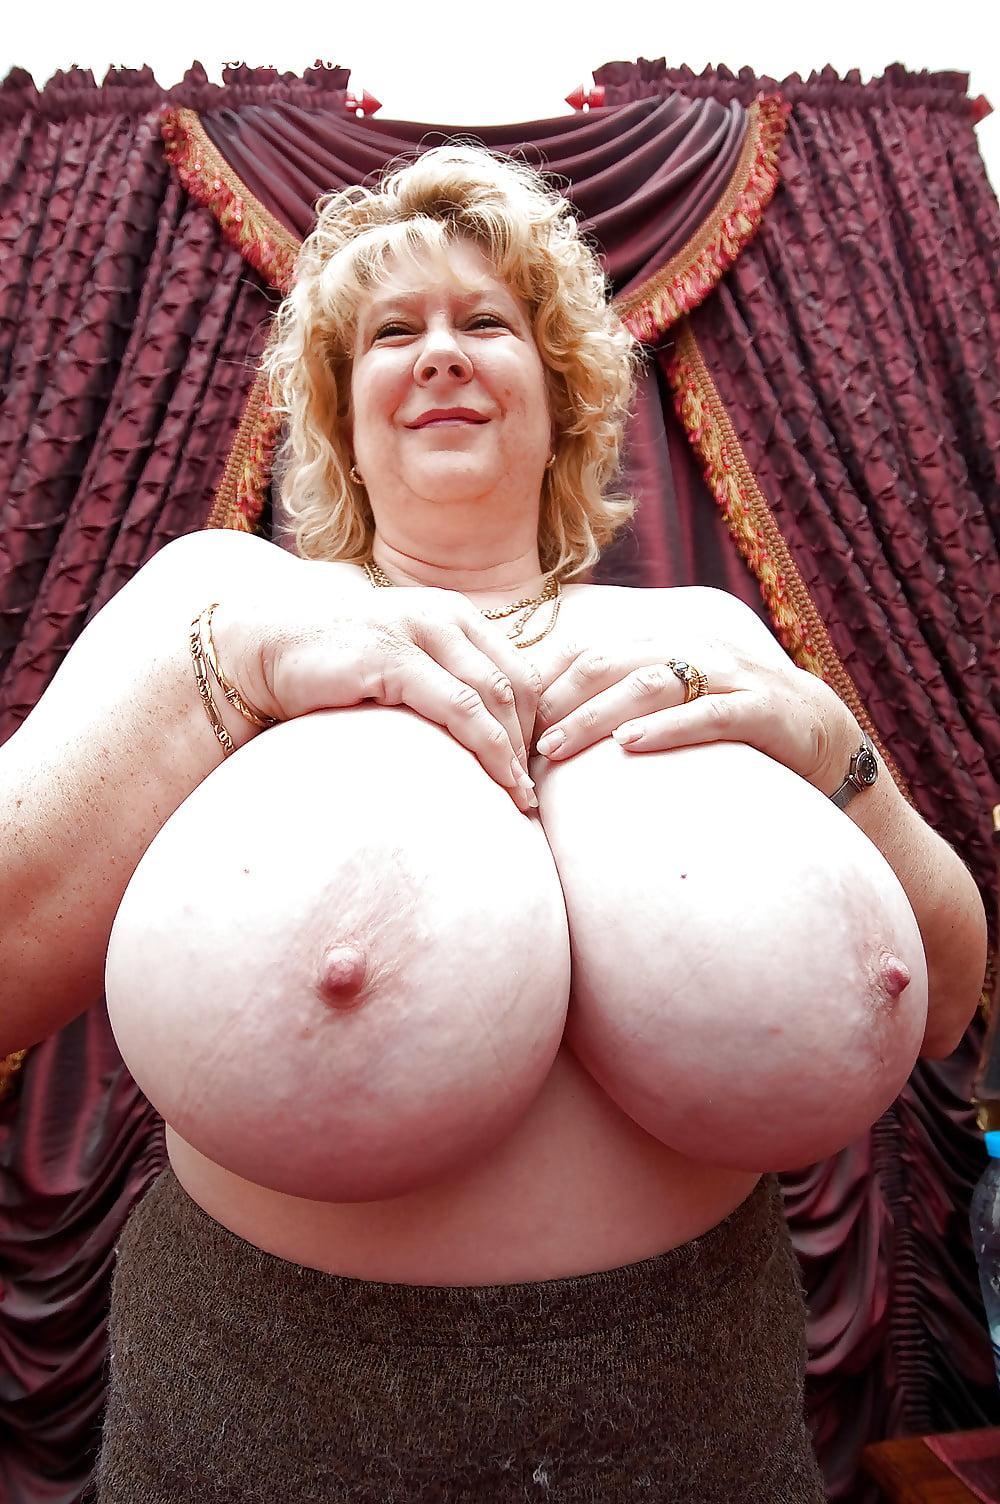 Very big tits